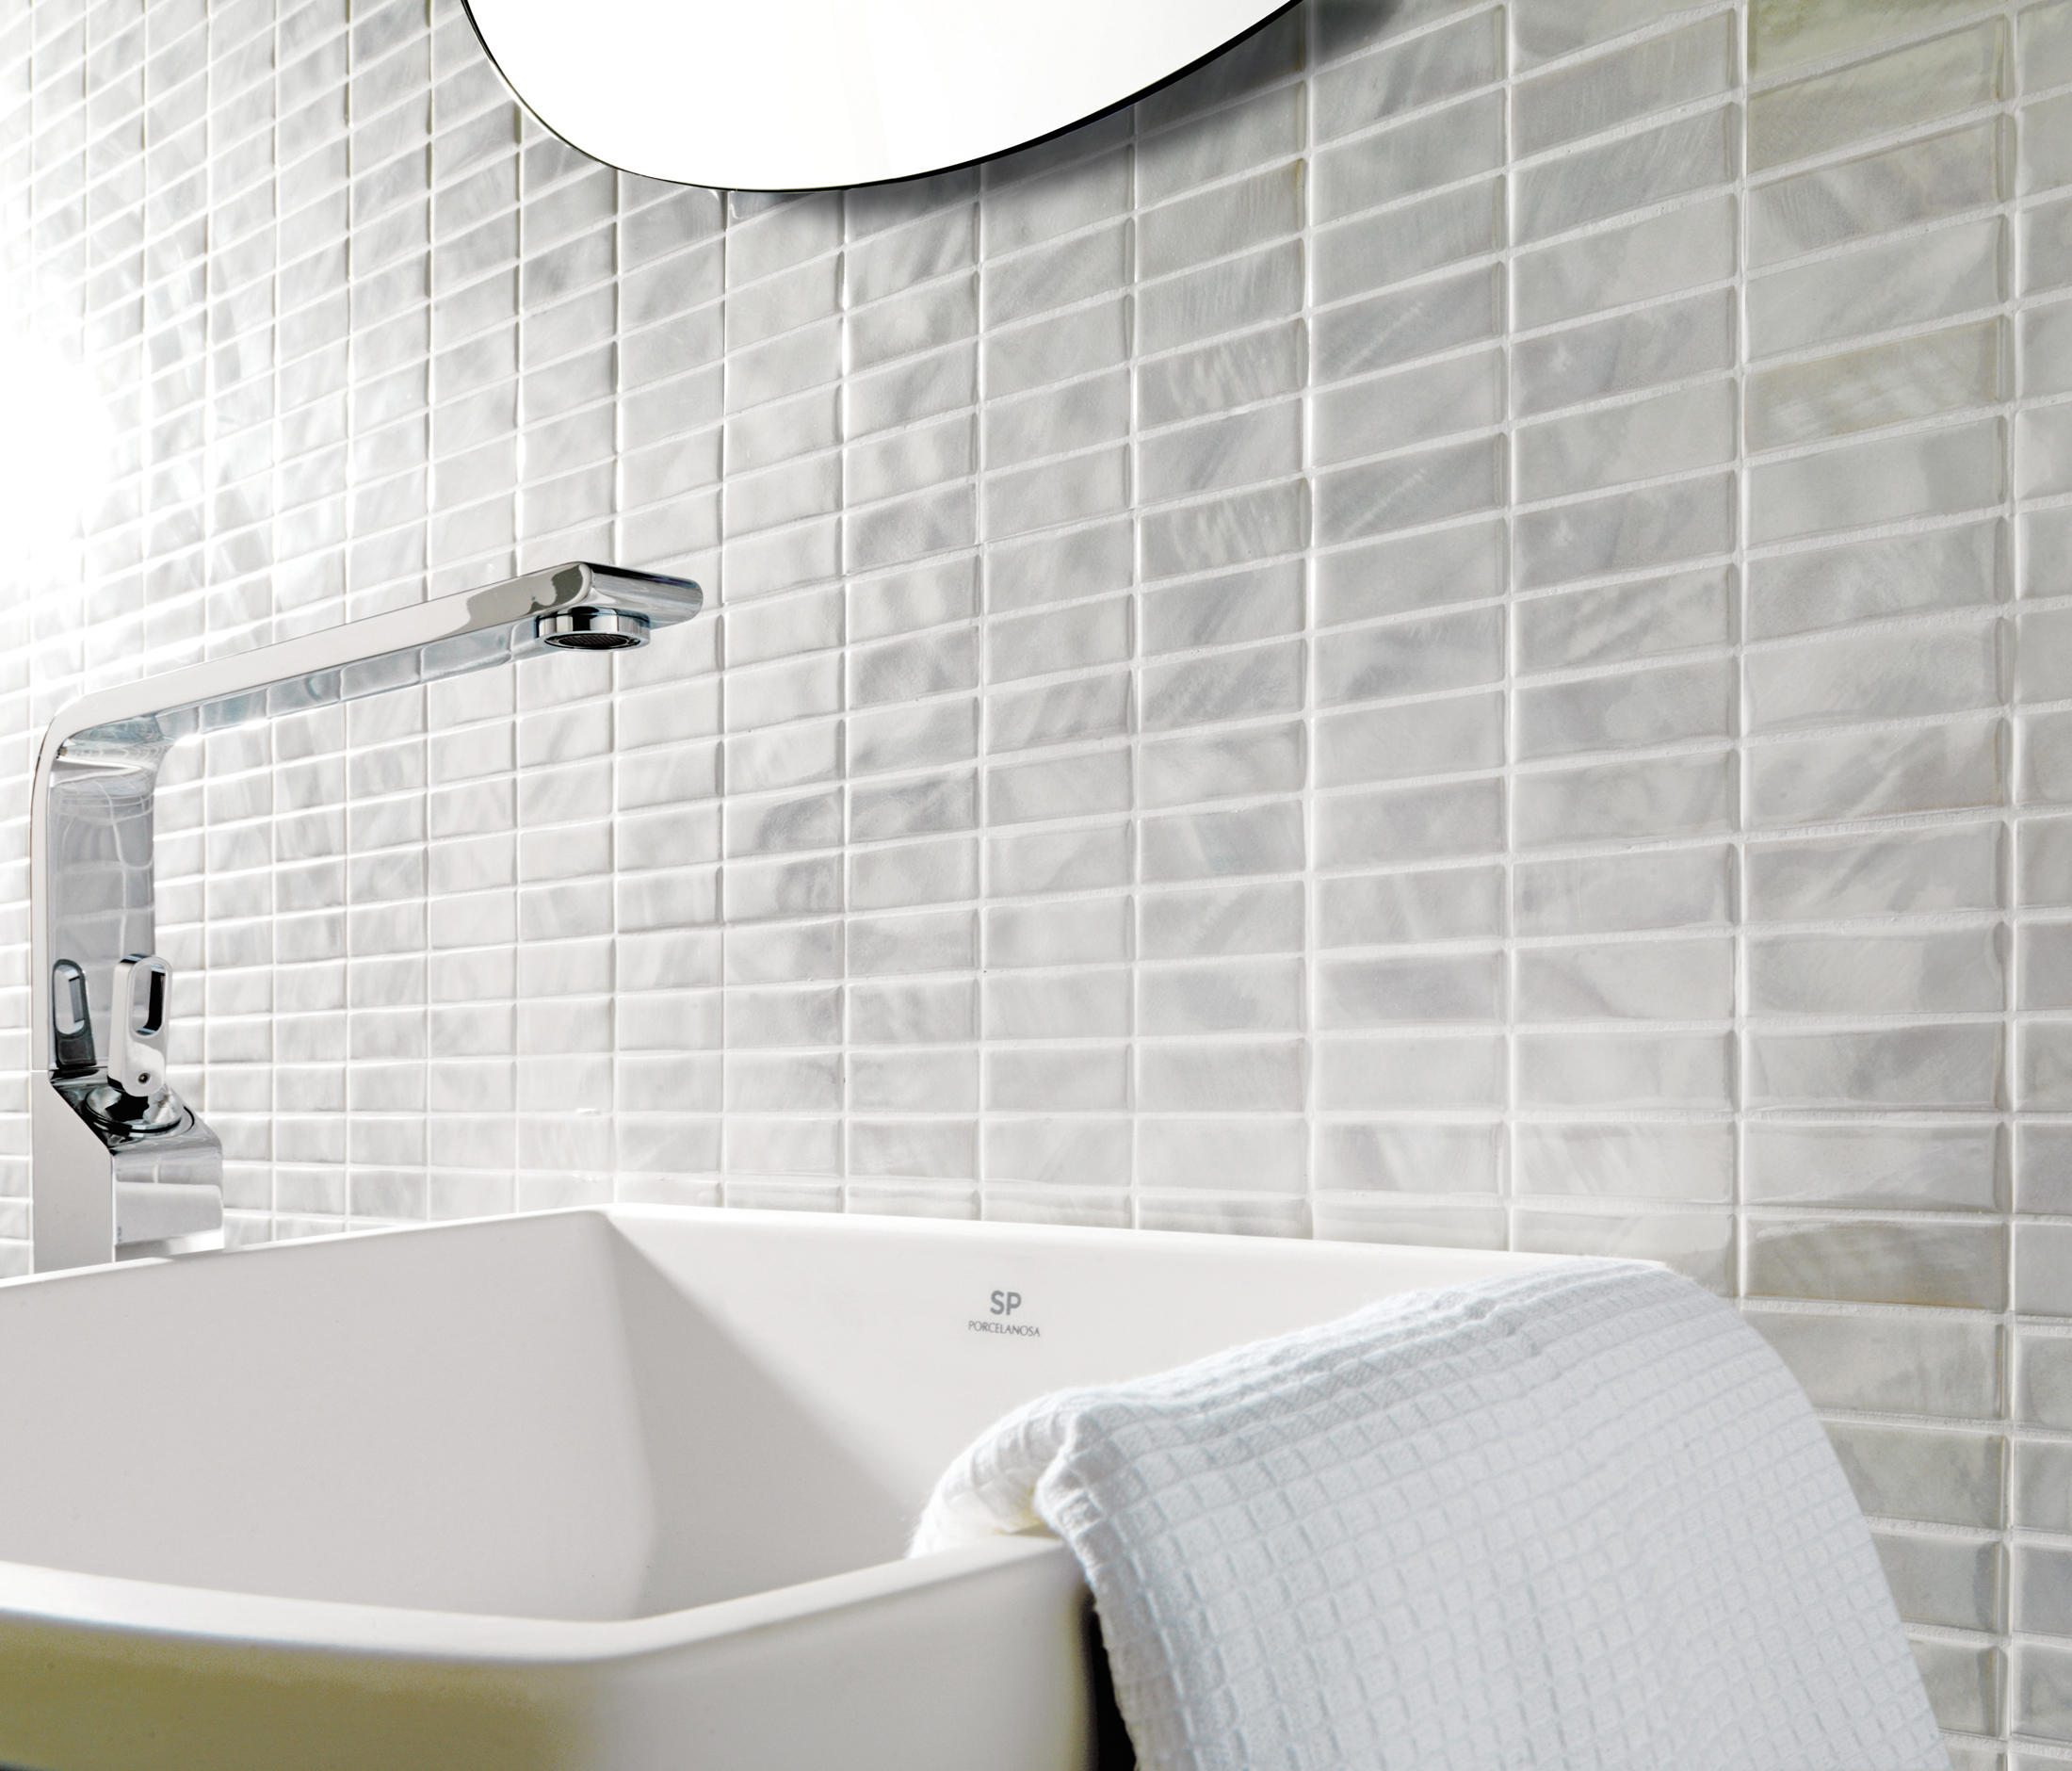 #7D764E PERLATO Ceramic Mosaics From Porcelanosa Architonic 2737 petite salle de bain gris et blanc 2200x1880 px @ aertt.com